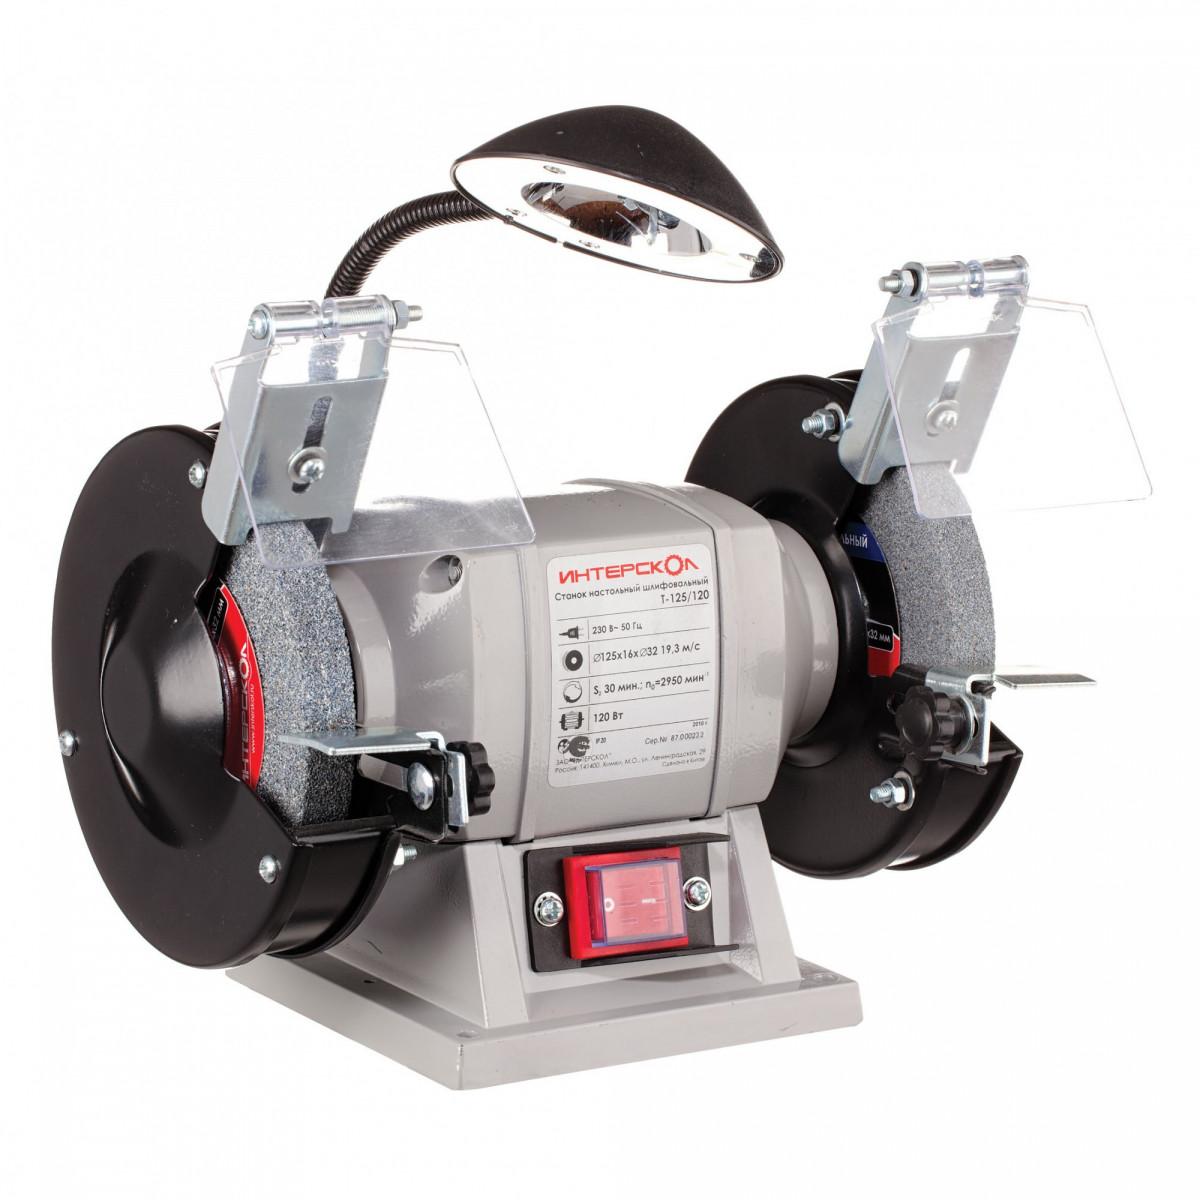 Точило Интерскол Т-125/120 (120Вт,125мм) с подсветкой